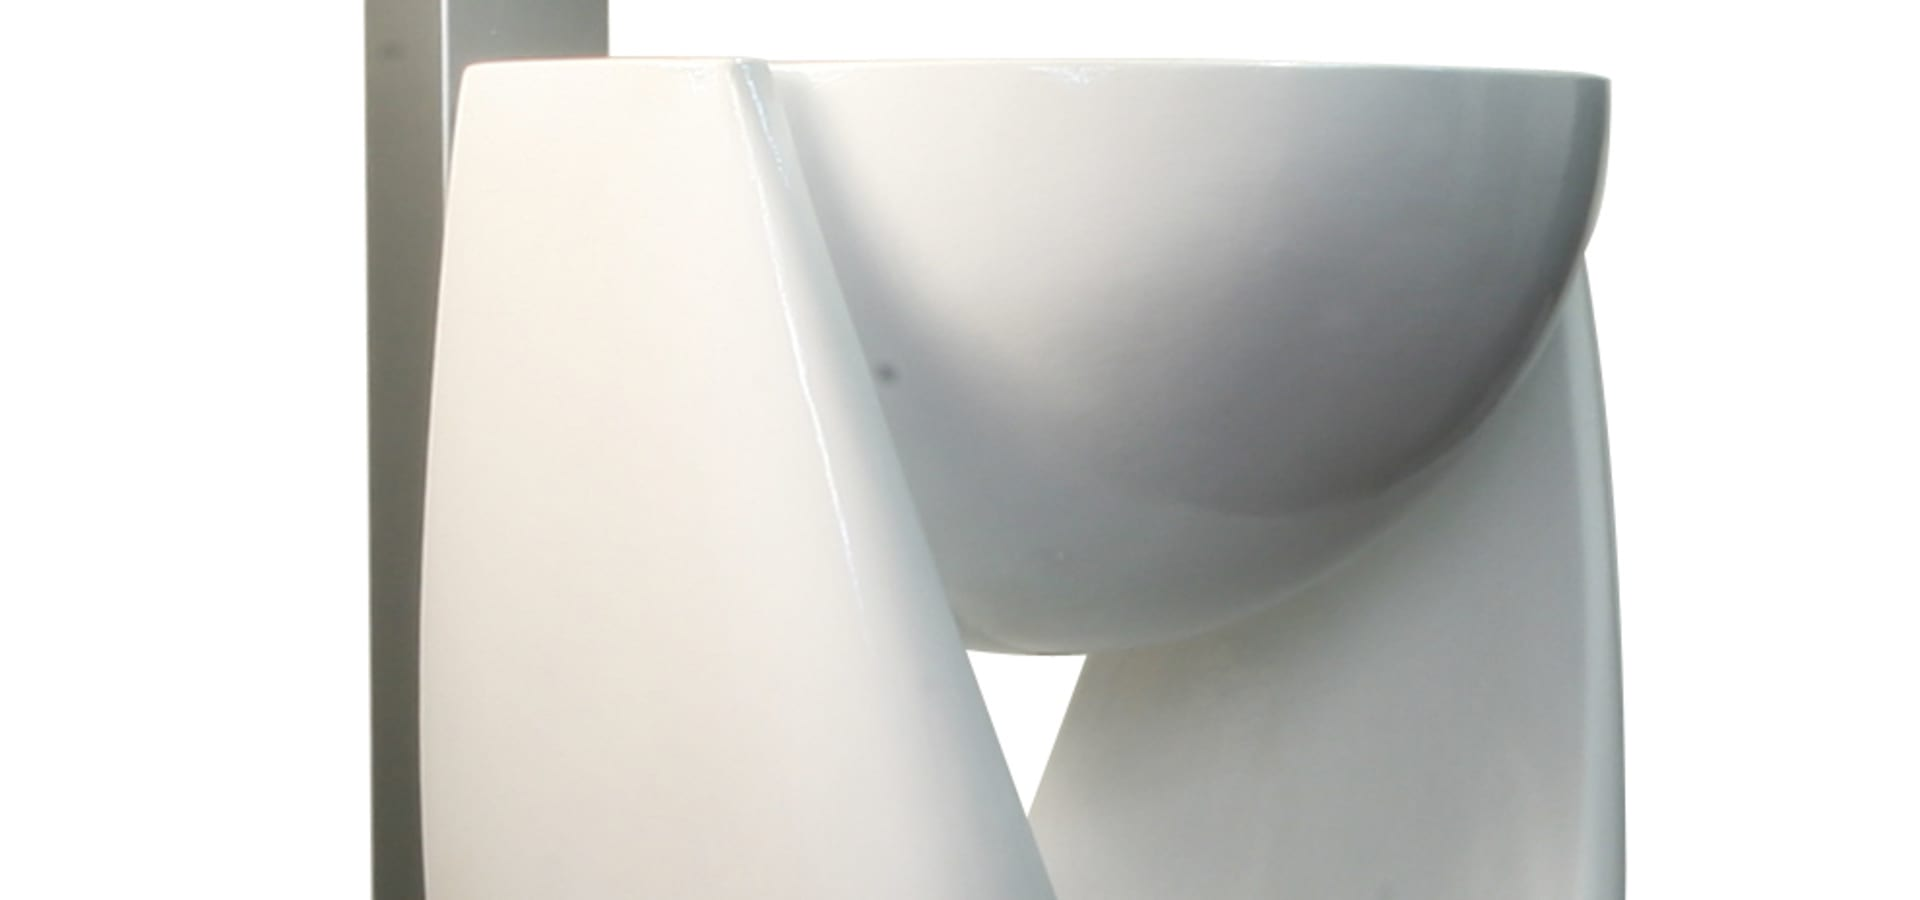 Alessandra Scarfò Design